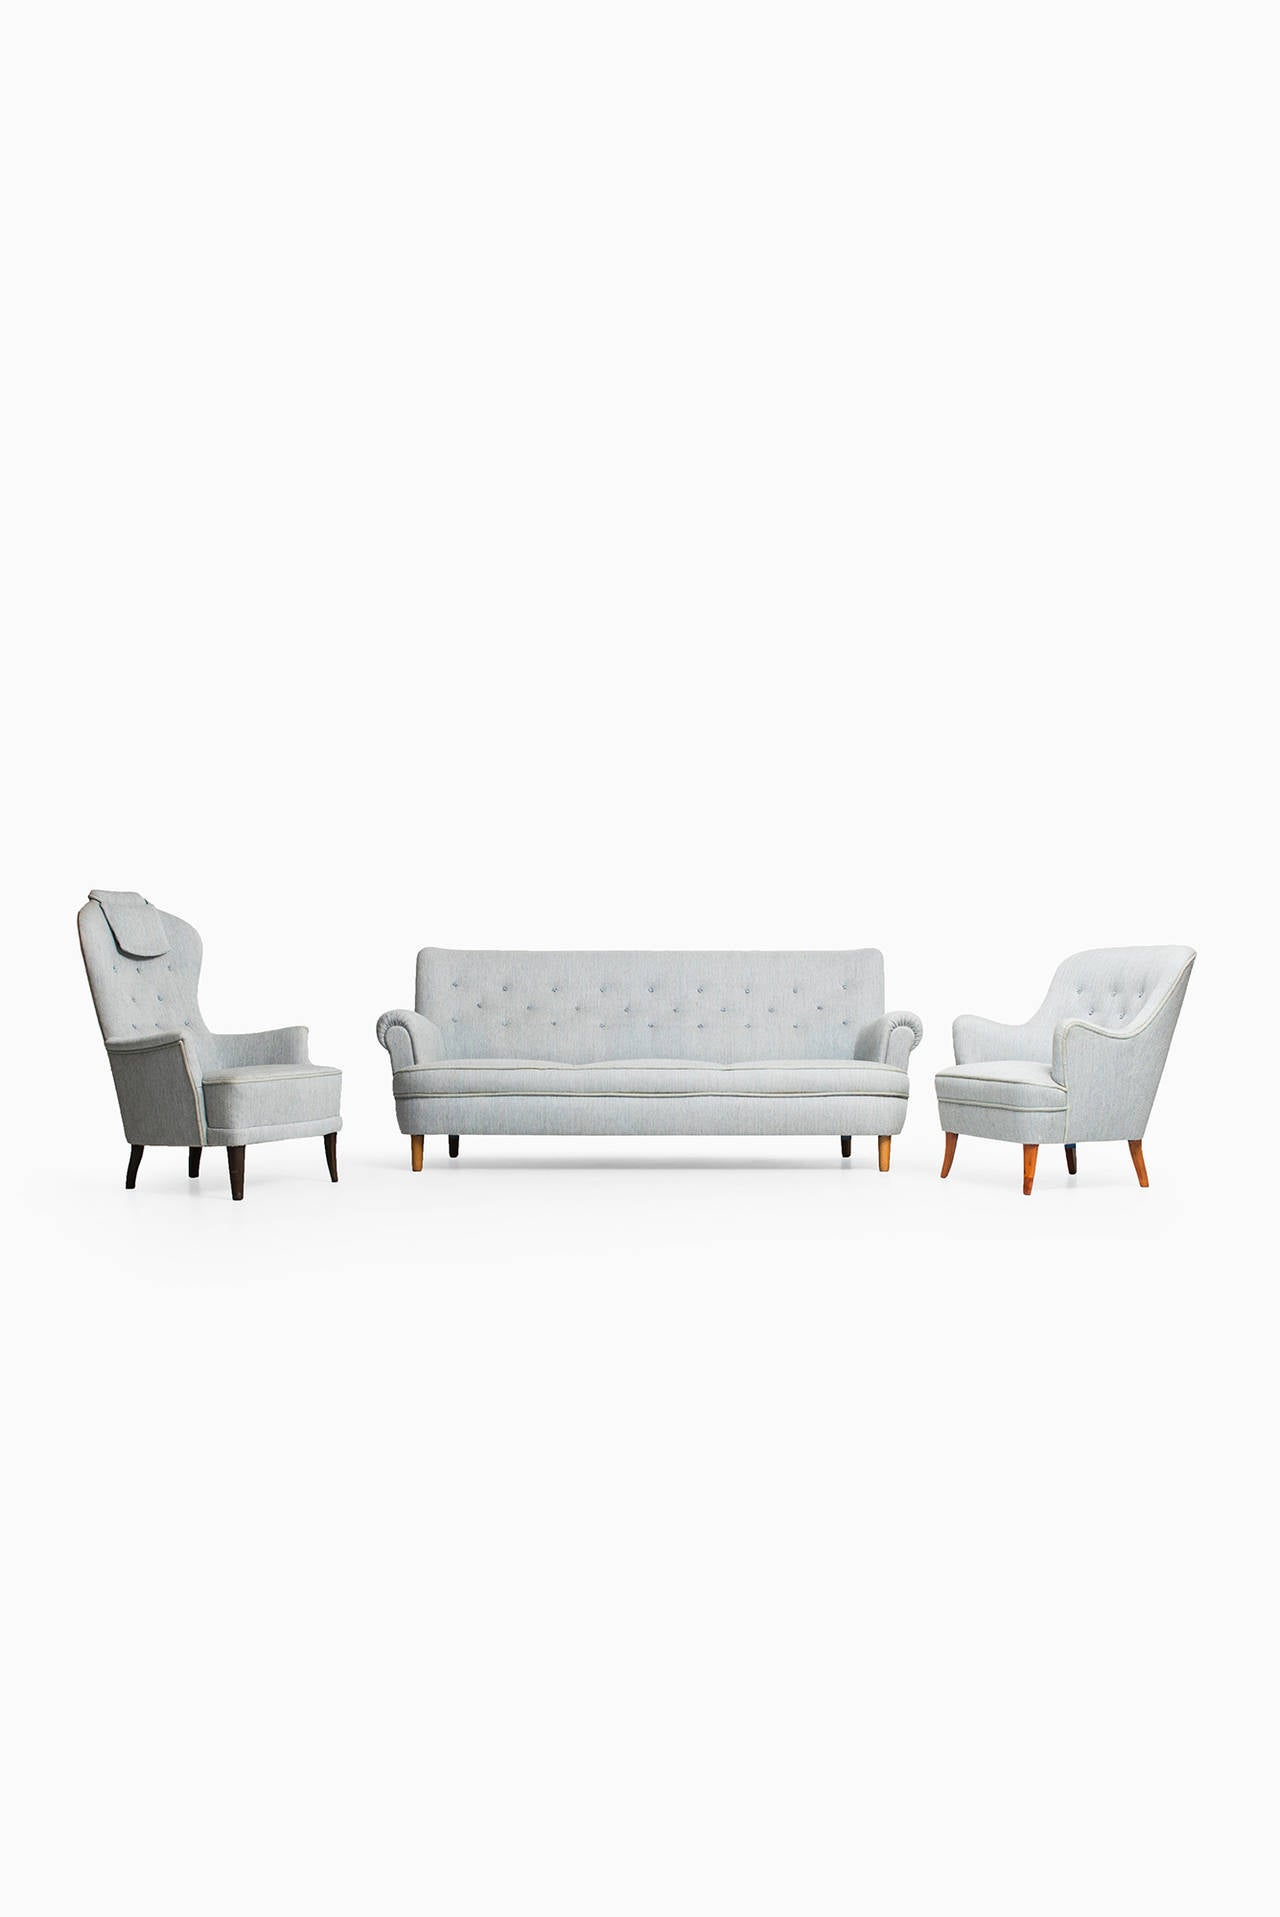 Carl Malmsten Easy Chair by O.H Sjögren in Sweden For Sale 1